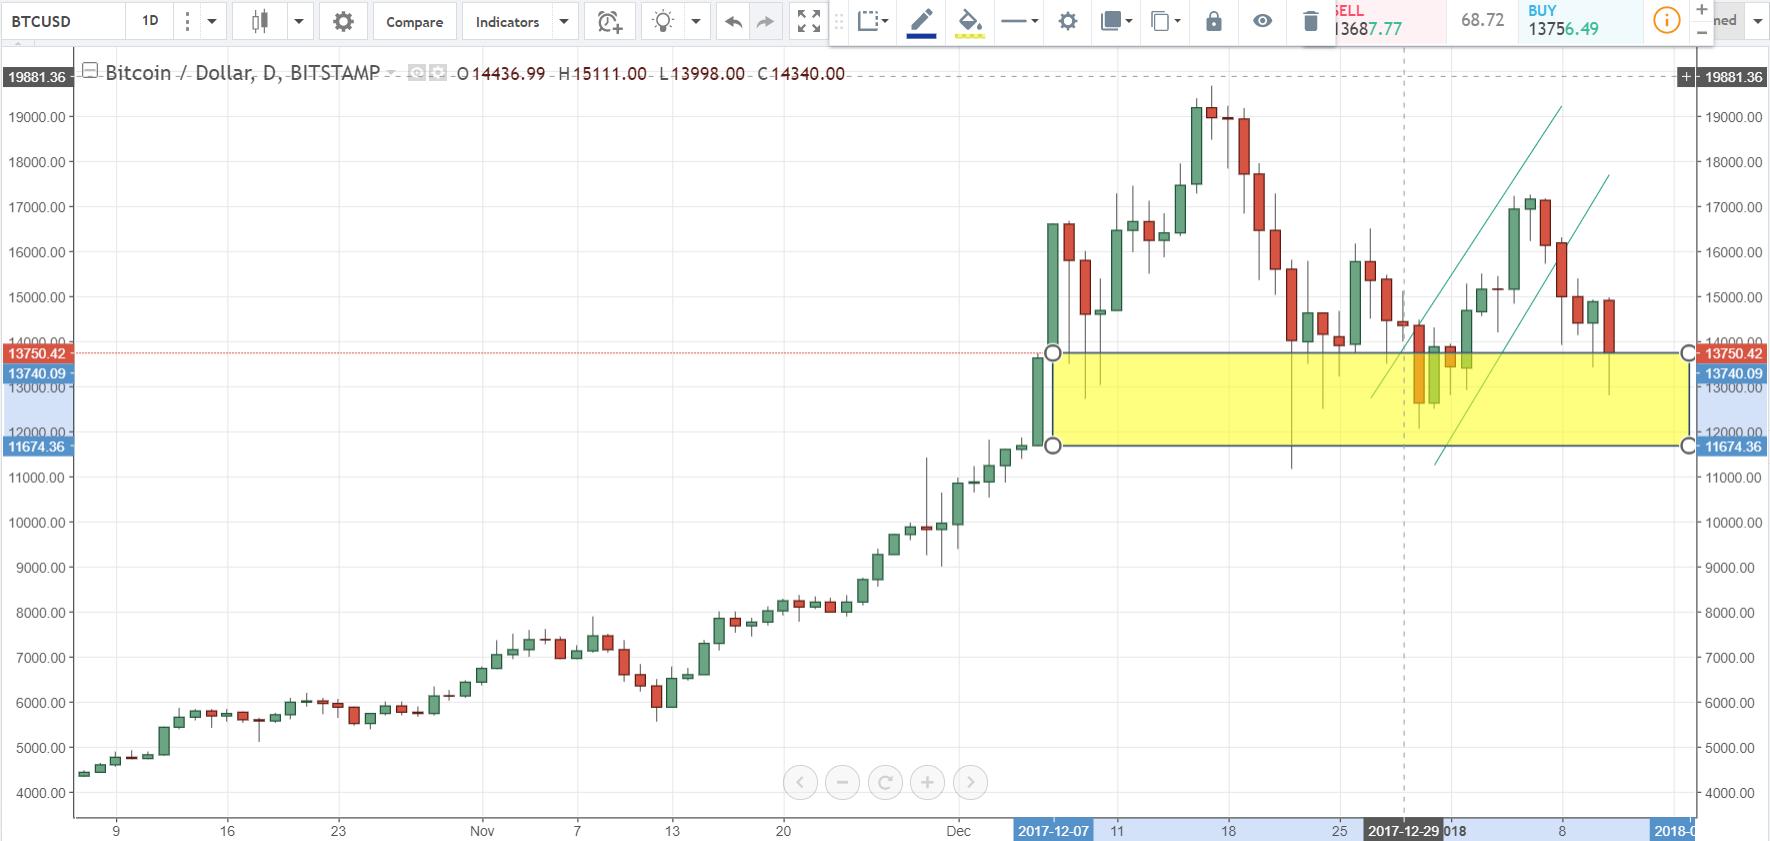 Bitcoin Usd Price